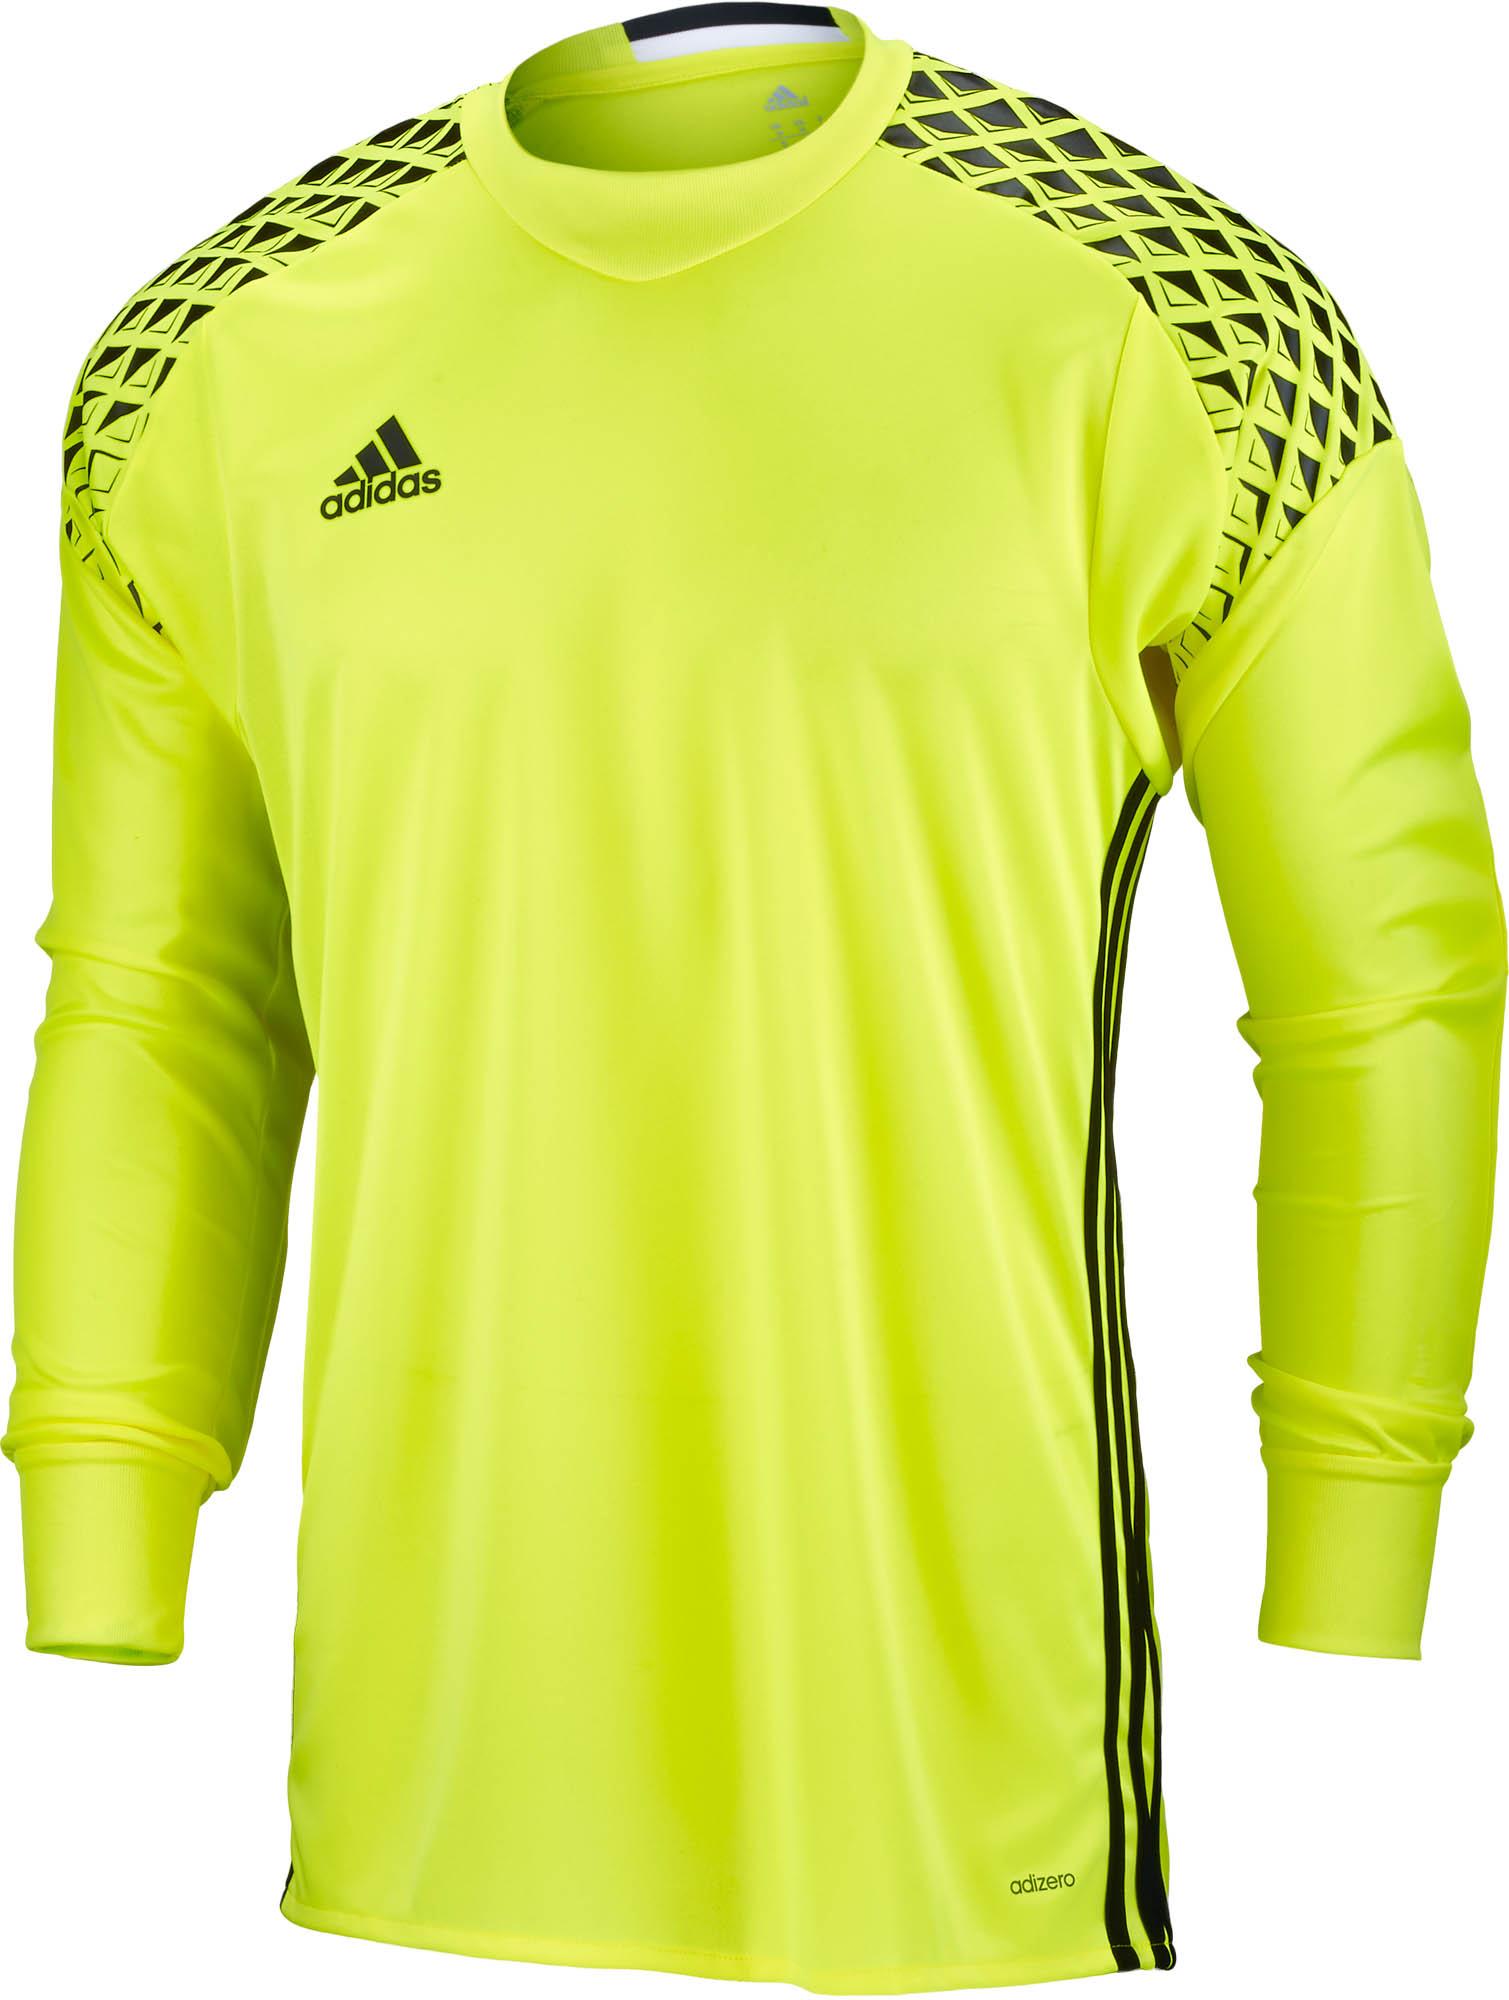 adidas Kids Onore 16 Goalkeeper Jersey - Solar Yellow/Black ...